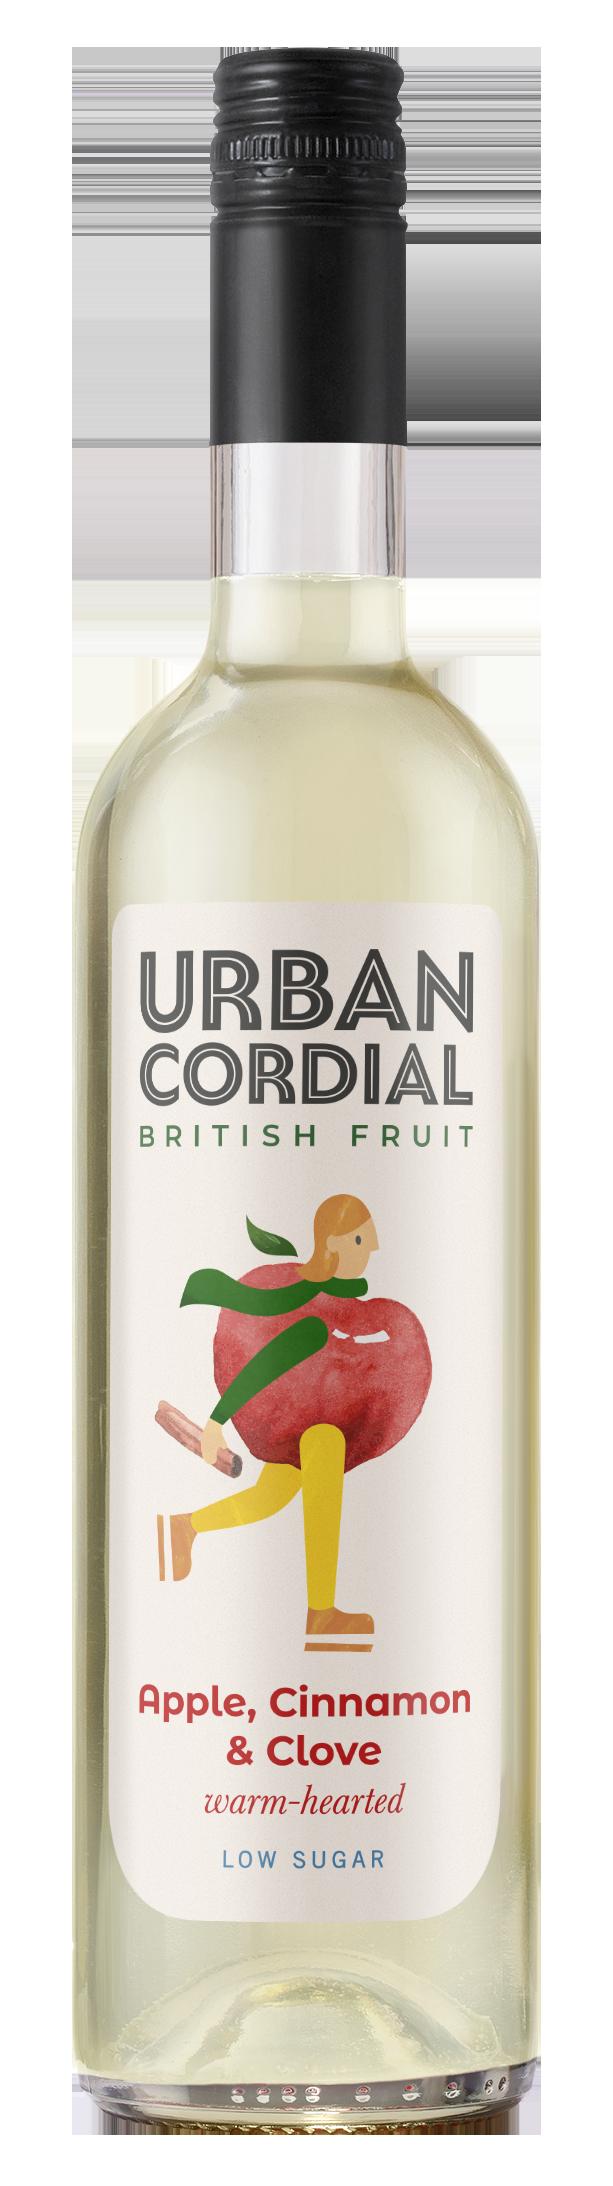 Apple, Cinnamon & Clove Cordial from Urban Cordials 500ml